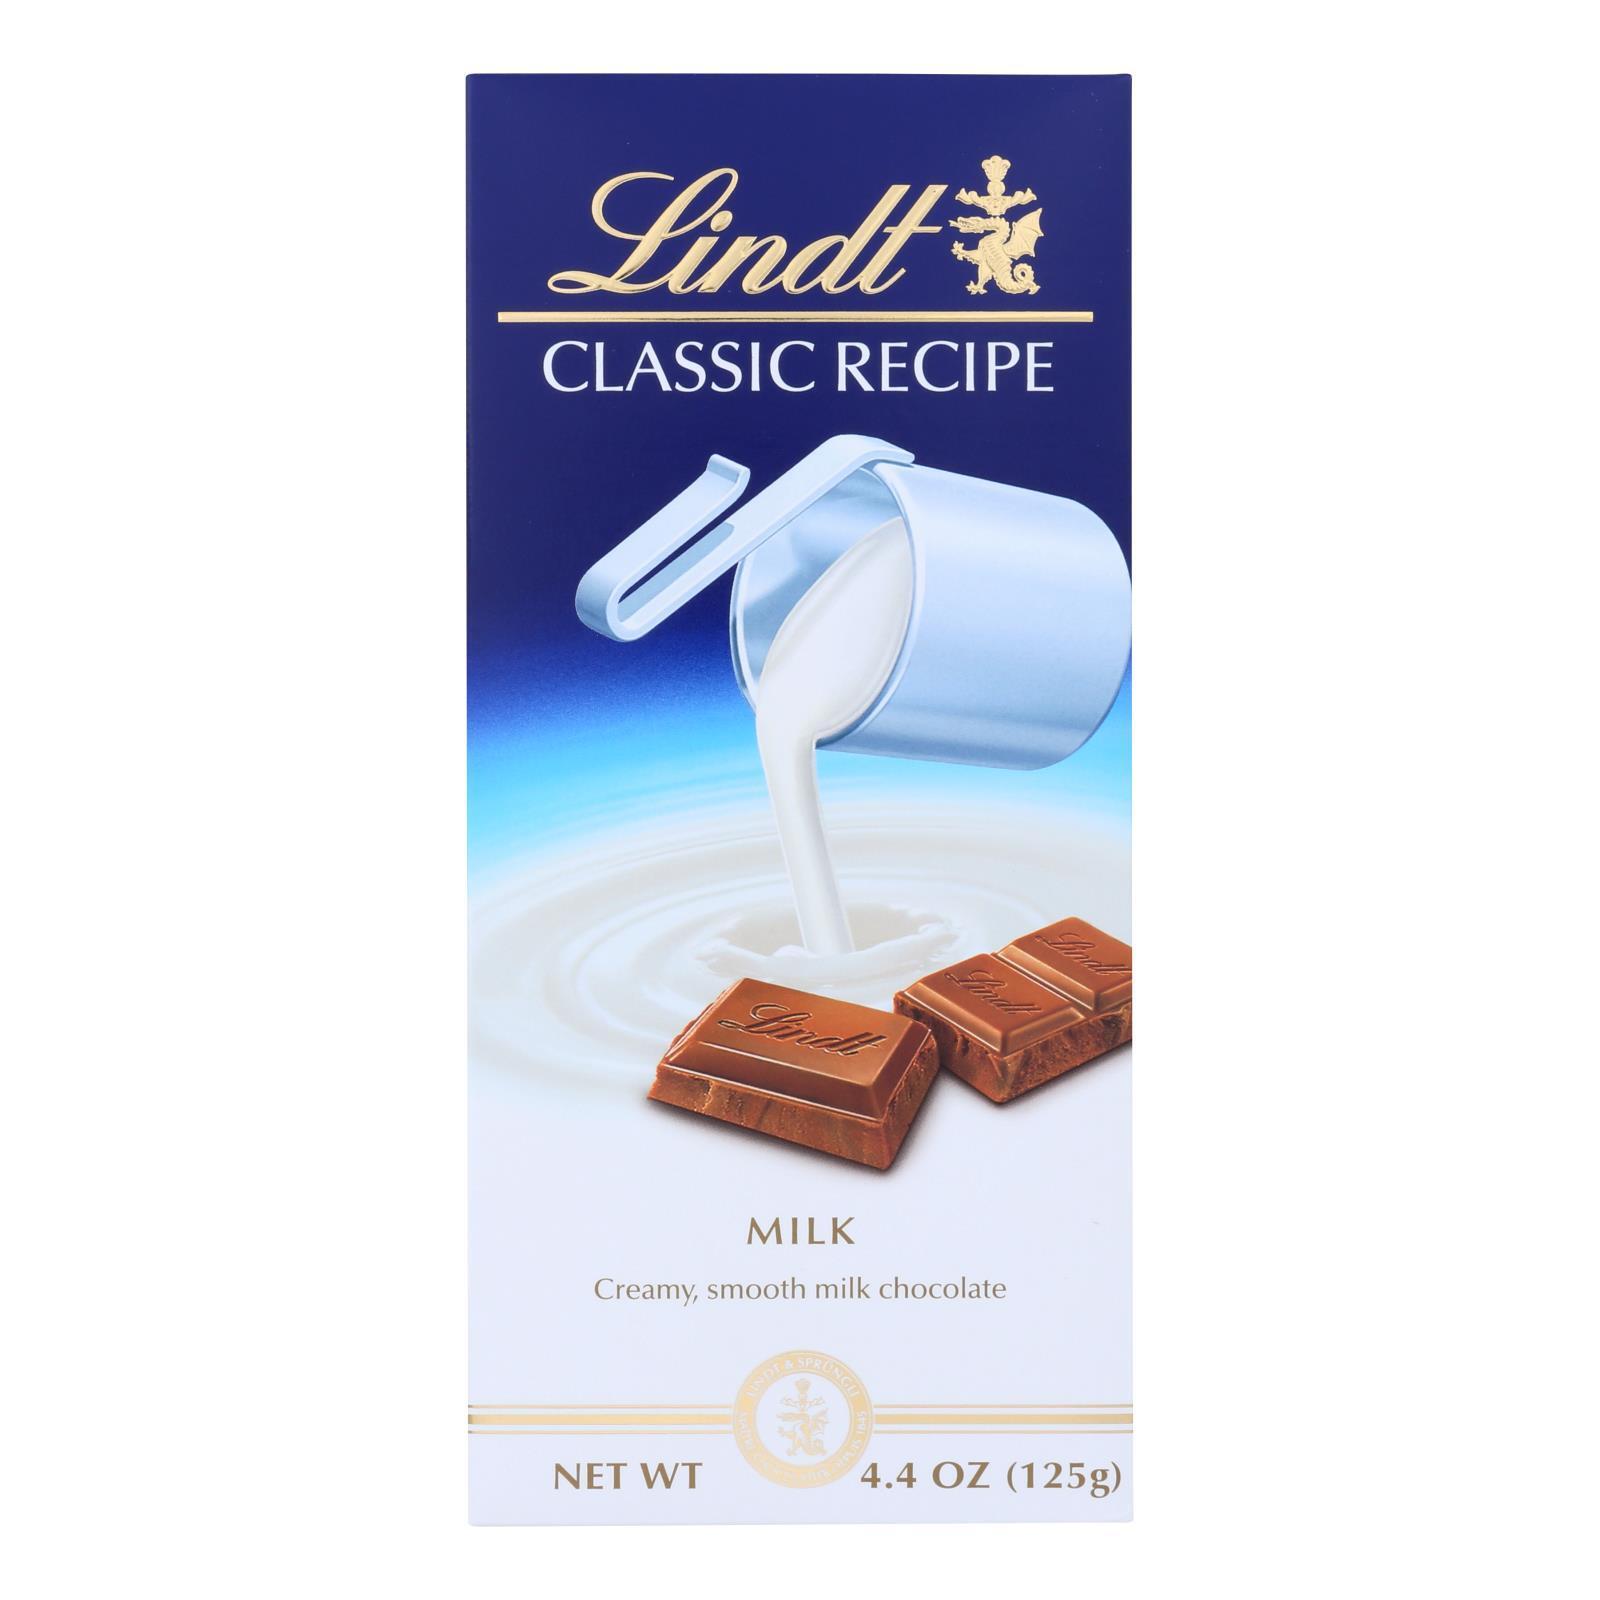 Lindt Chocolate Bar - Milk Chocolate - 31 Percent Cocoa - Classic Recipe - 4.4 oz Bars - Case of 12